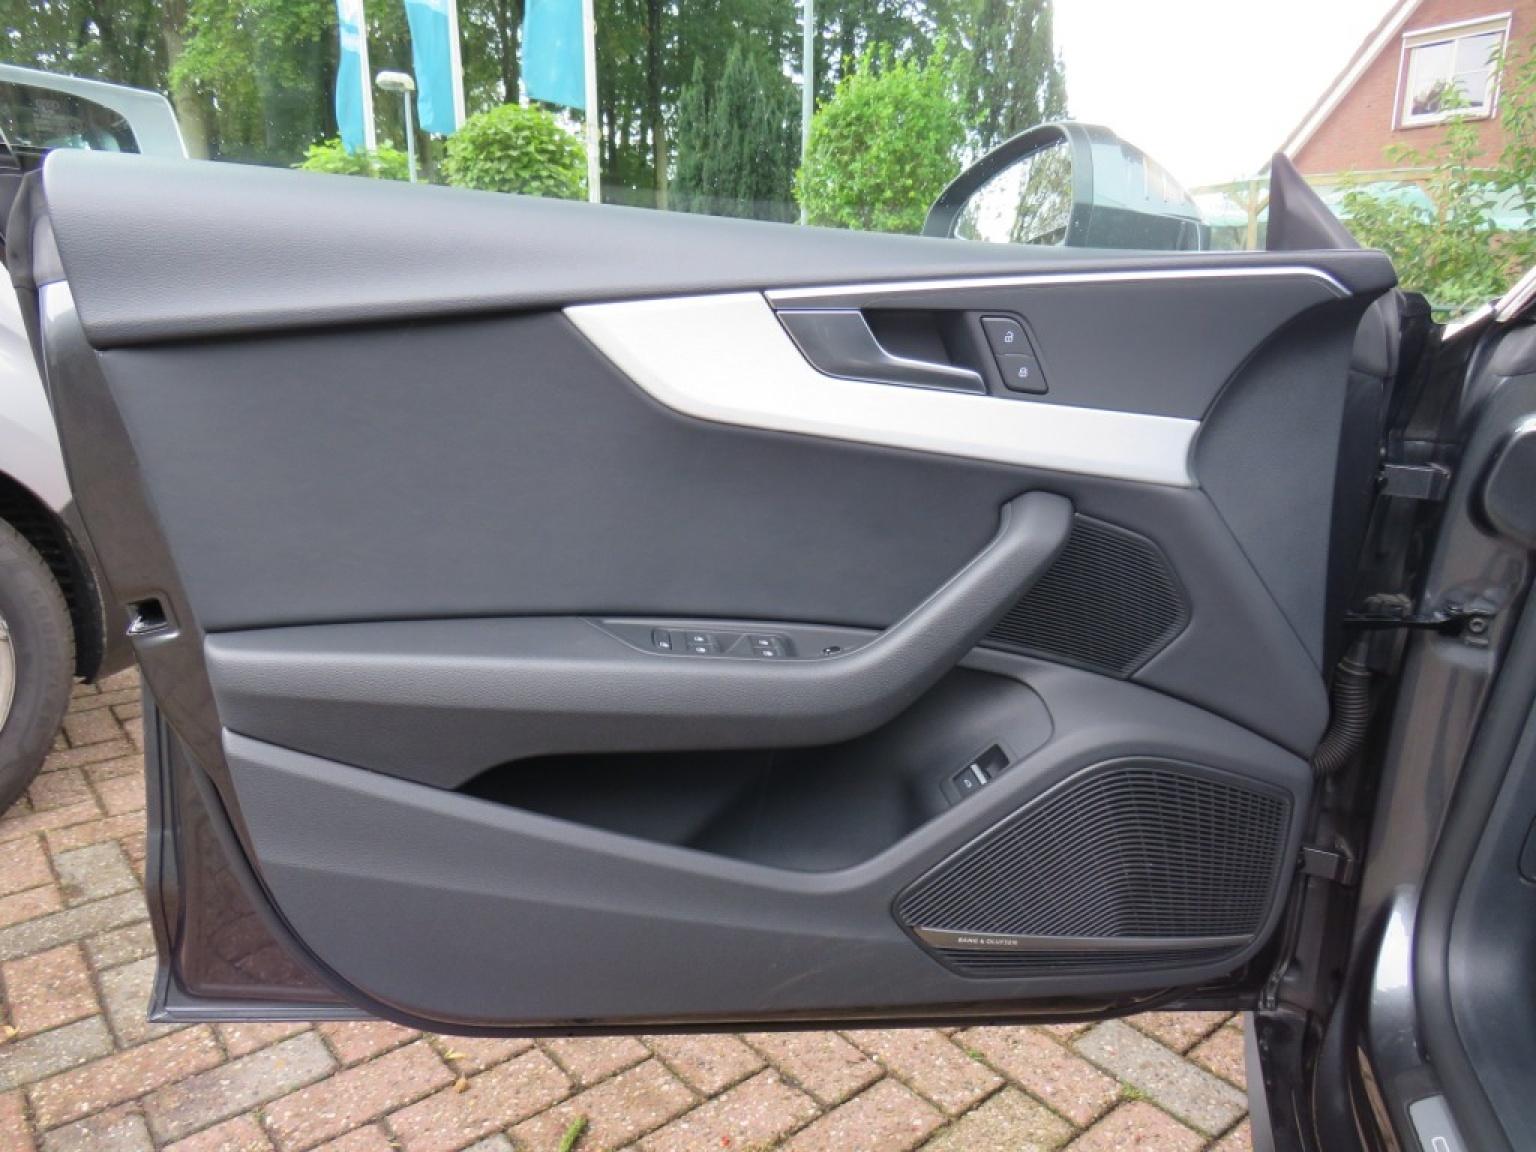 Audi-A5-11